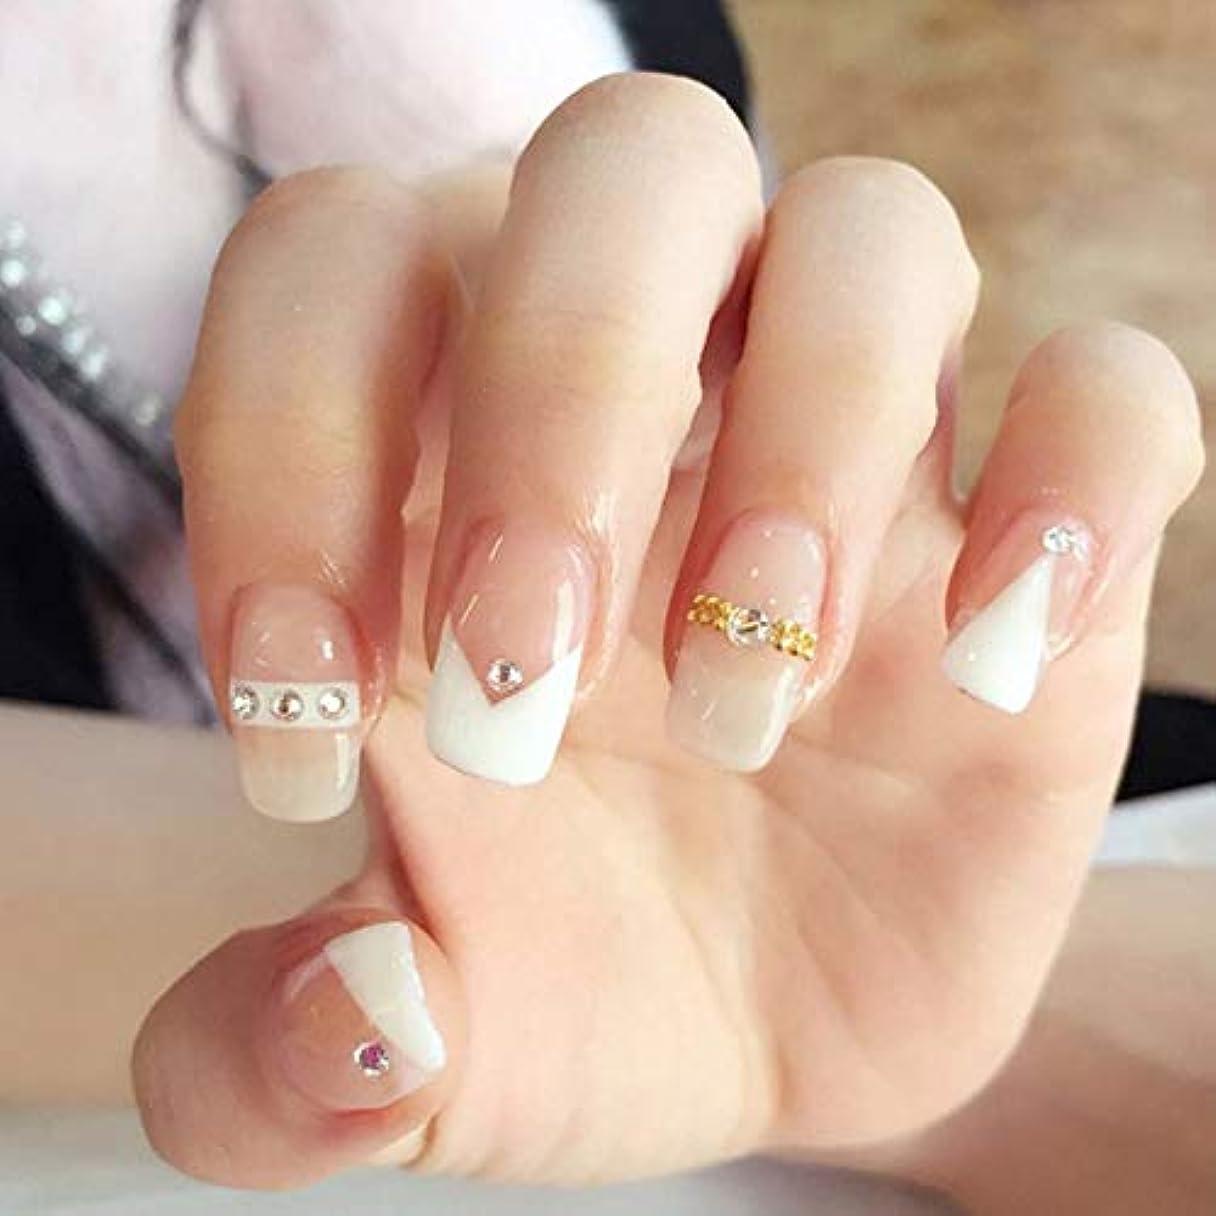 XUTXZKA 花嫁のネイルアートステッカーゴールドダイヤモンドホワイトステッチカラーフルカバーネイルフェイクネイル